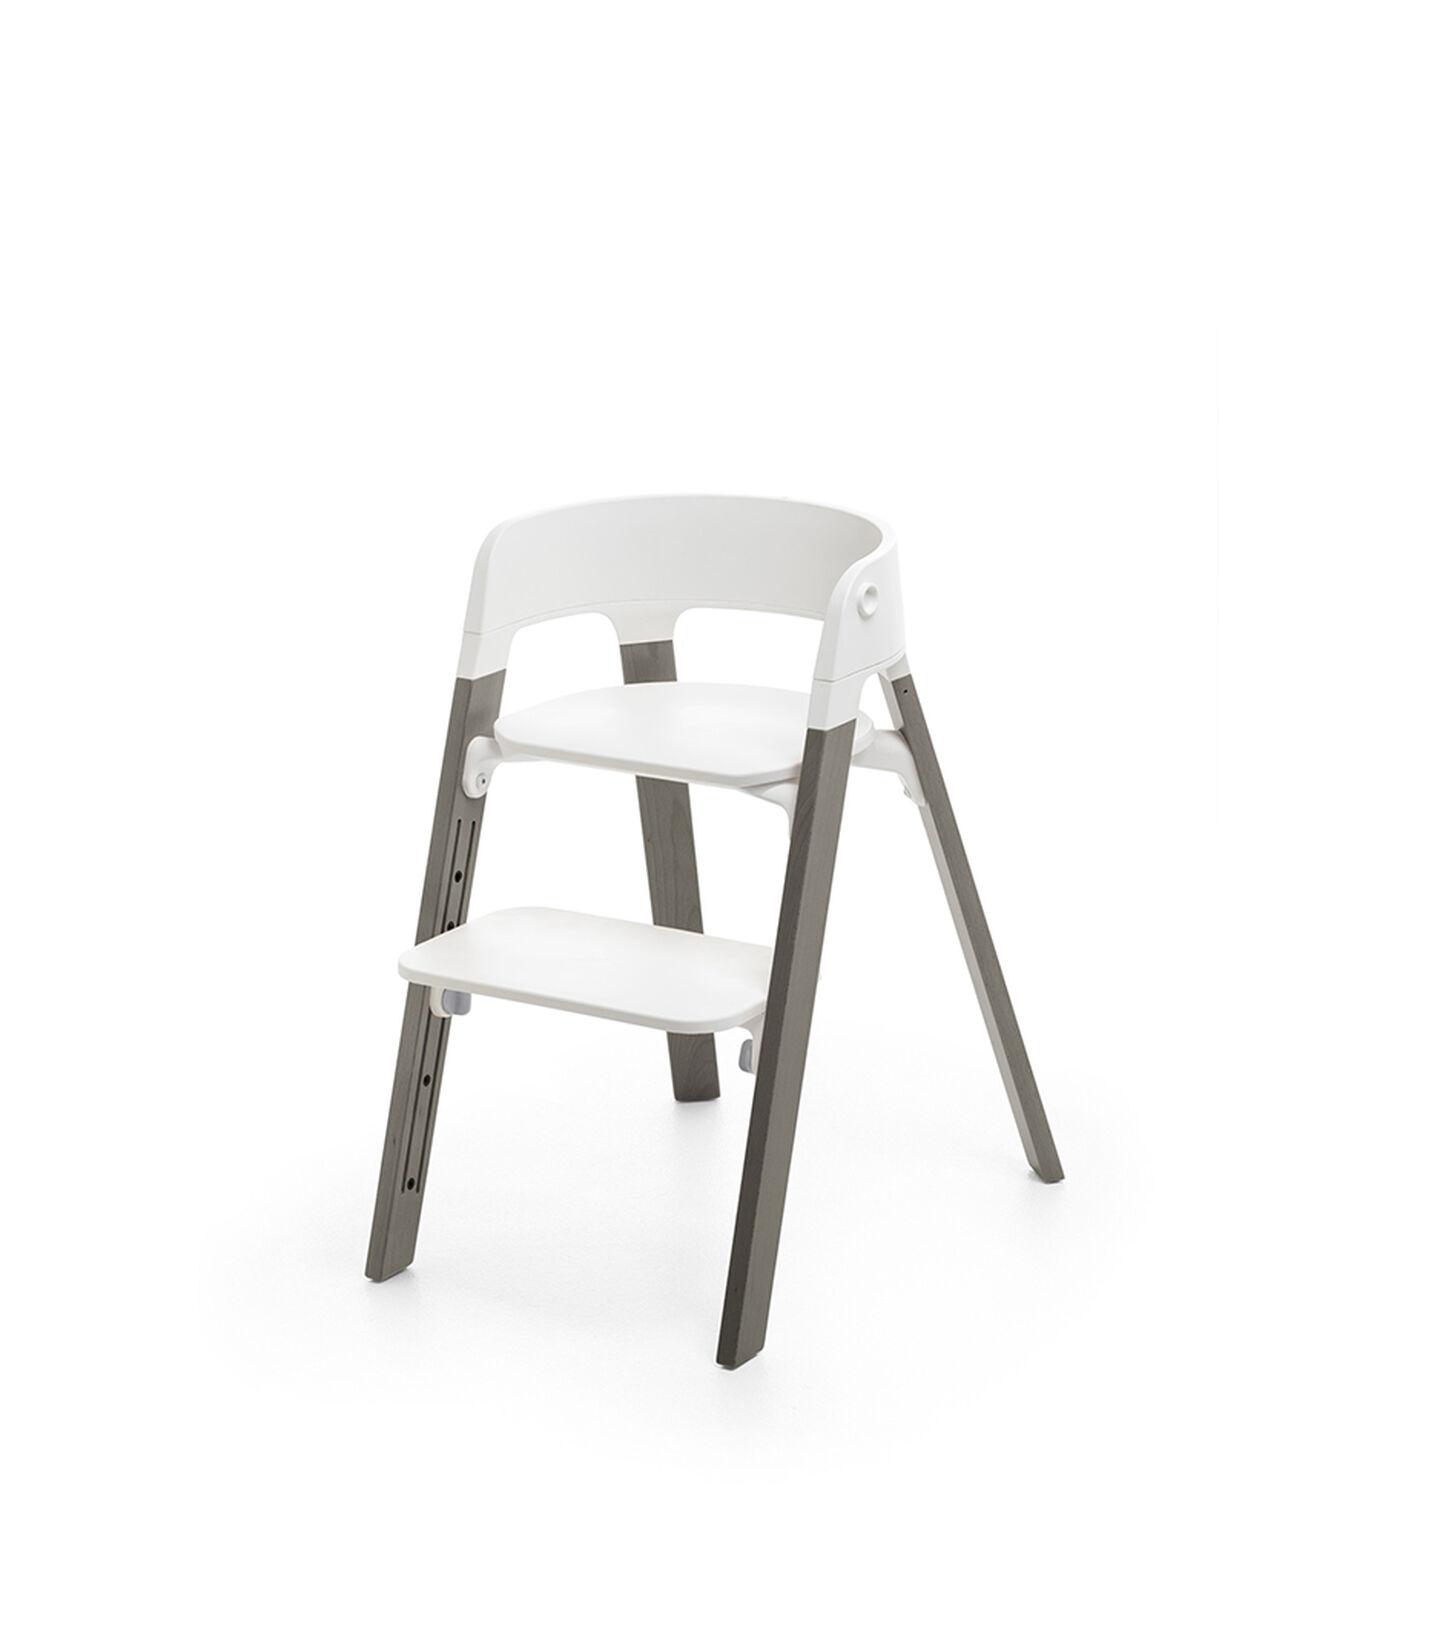 Stokke® Steps™ Chair White Seat Hazy Grey Legs, Hazy Grey, mainview view 2